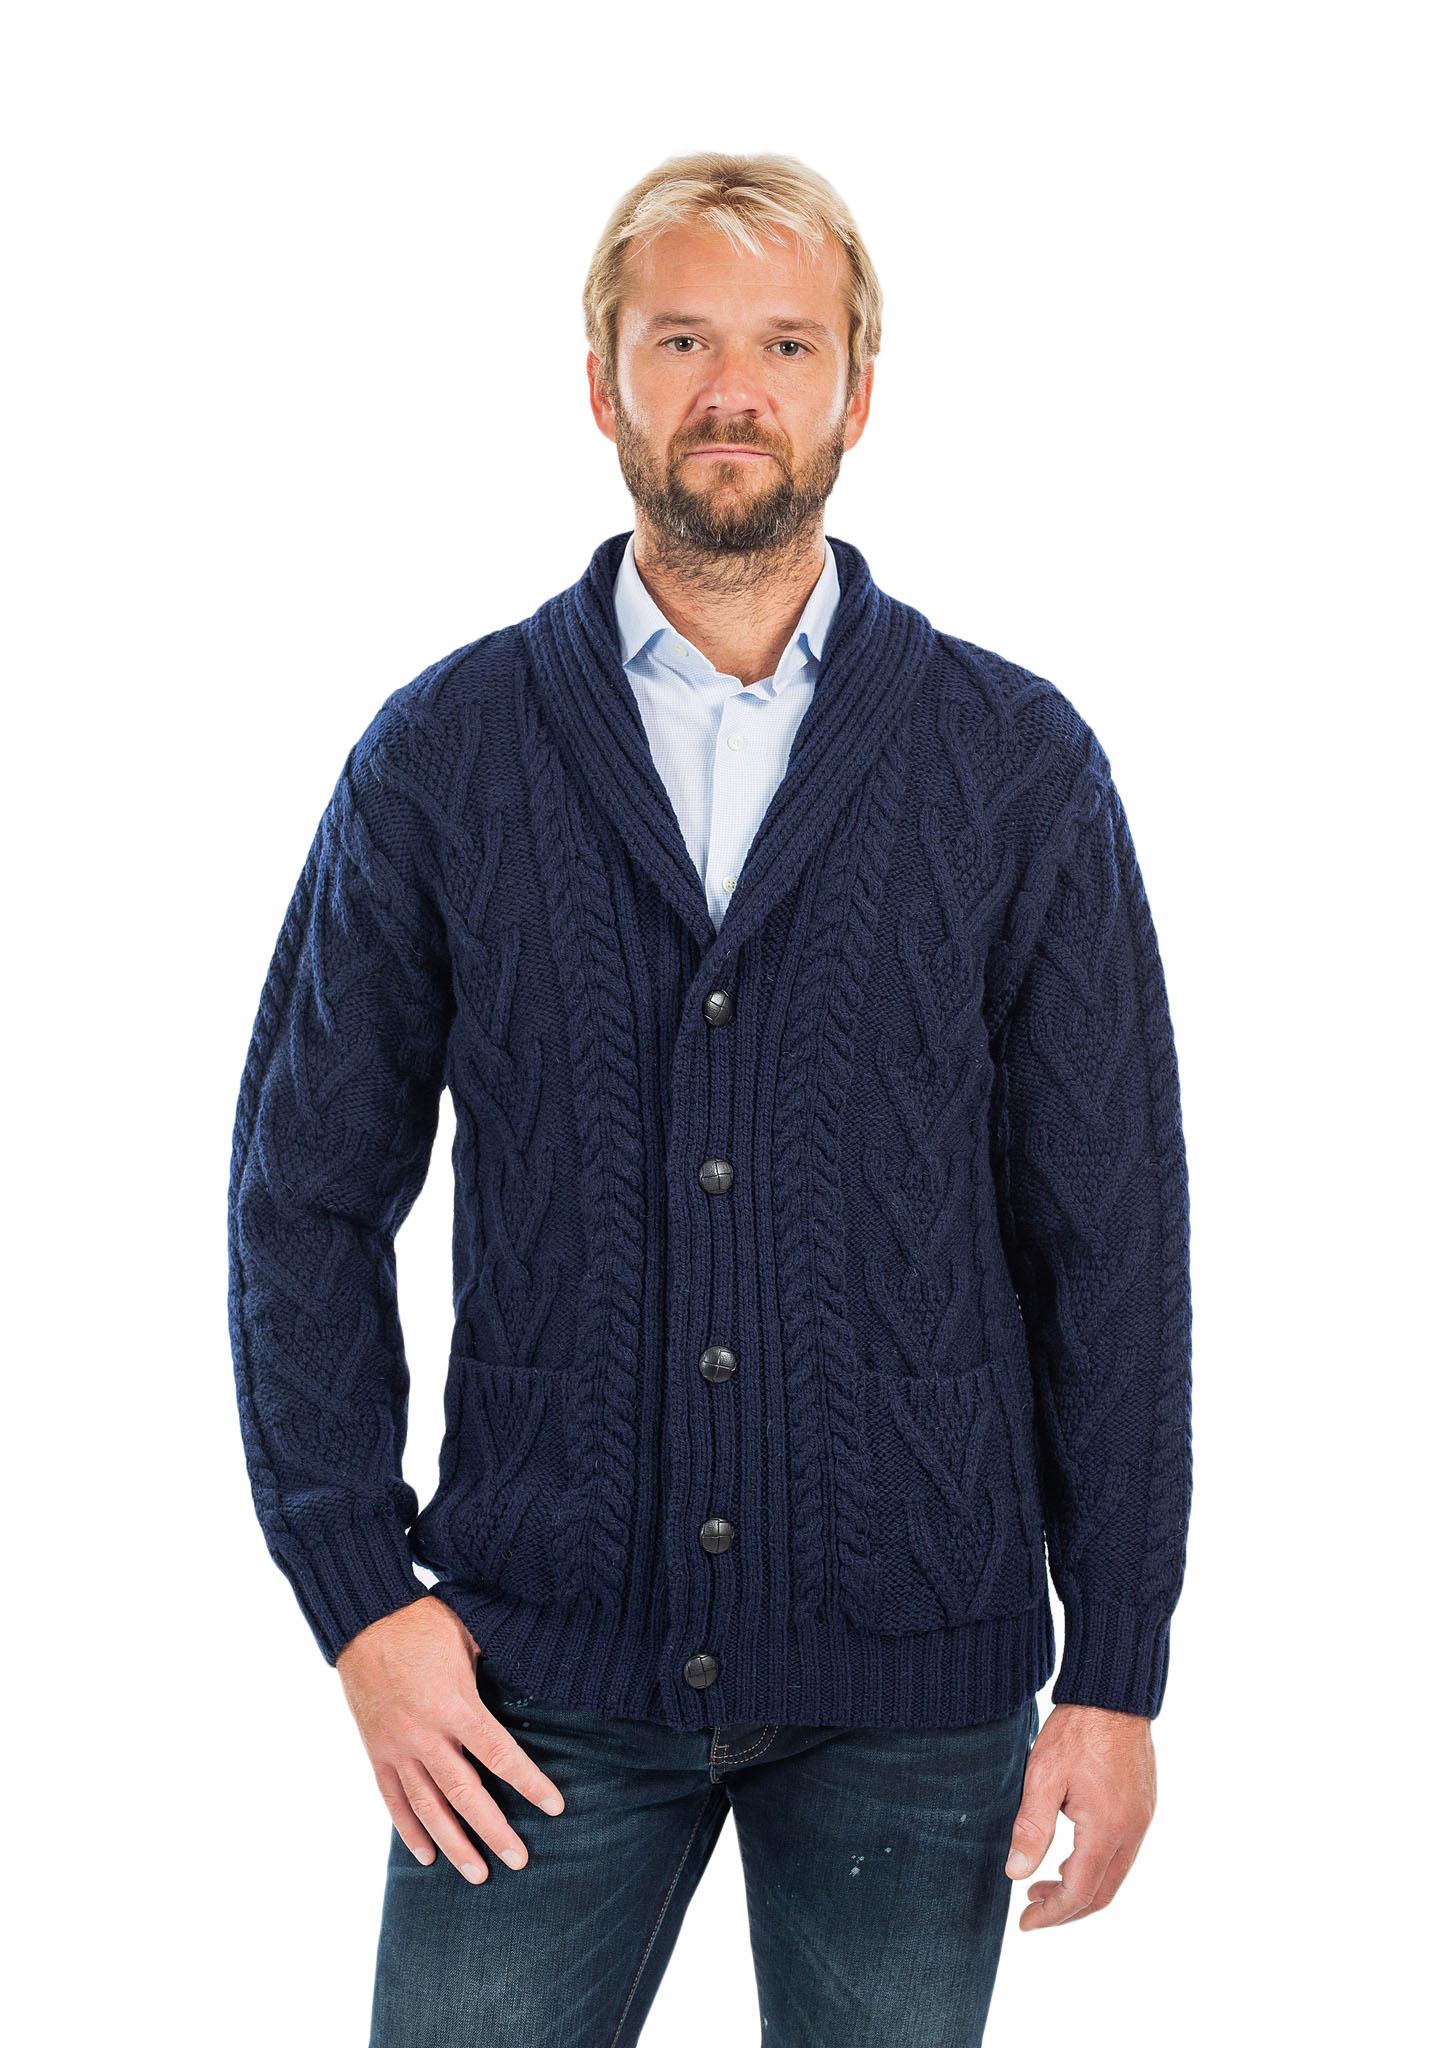 SAOL-Mens-Irish-Merino-Wool-Cardigan-Shawl-Collar-Front-Pockets-Aran-Cable-Knit thumbnail 22